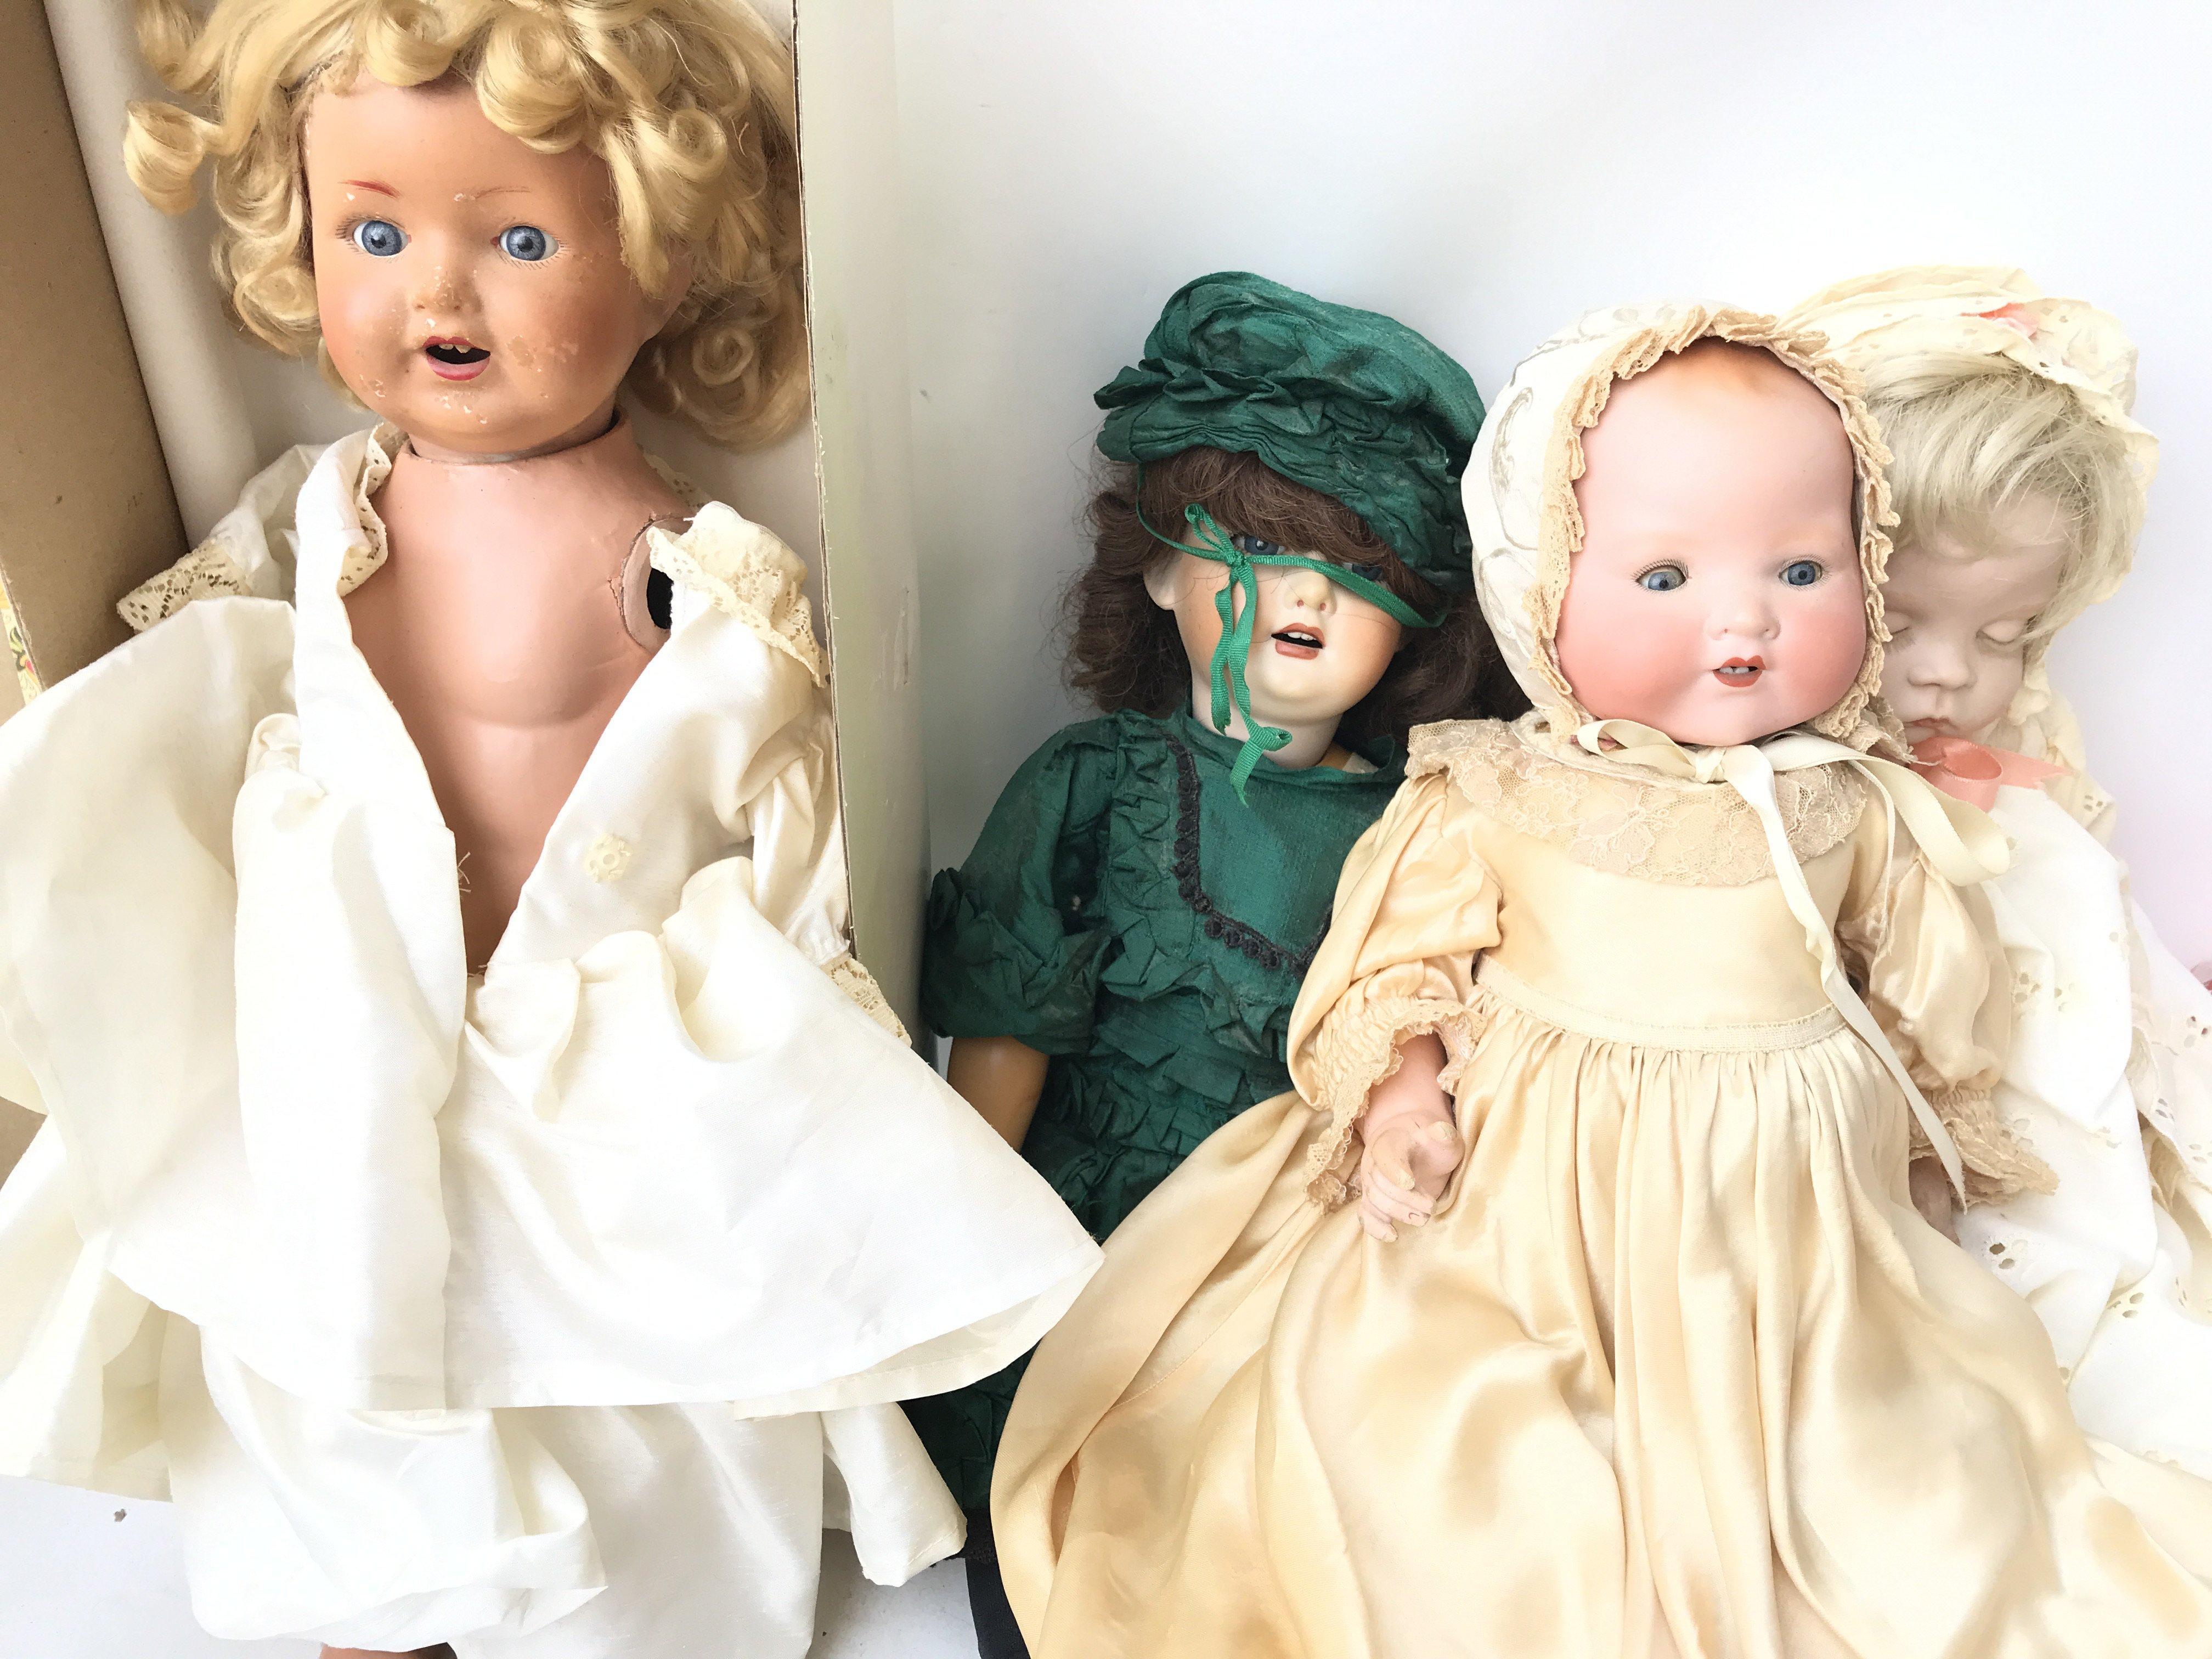 A A and M Doll in a Child Gown and 3 Others A/F. - Image 2 of 2